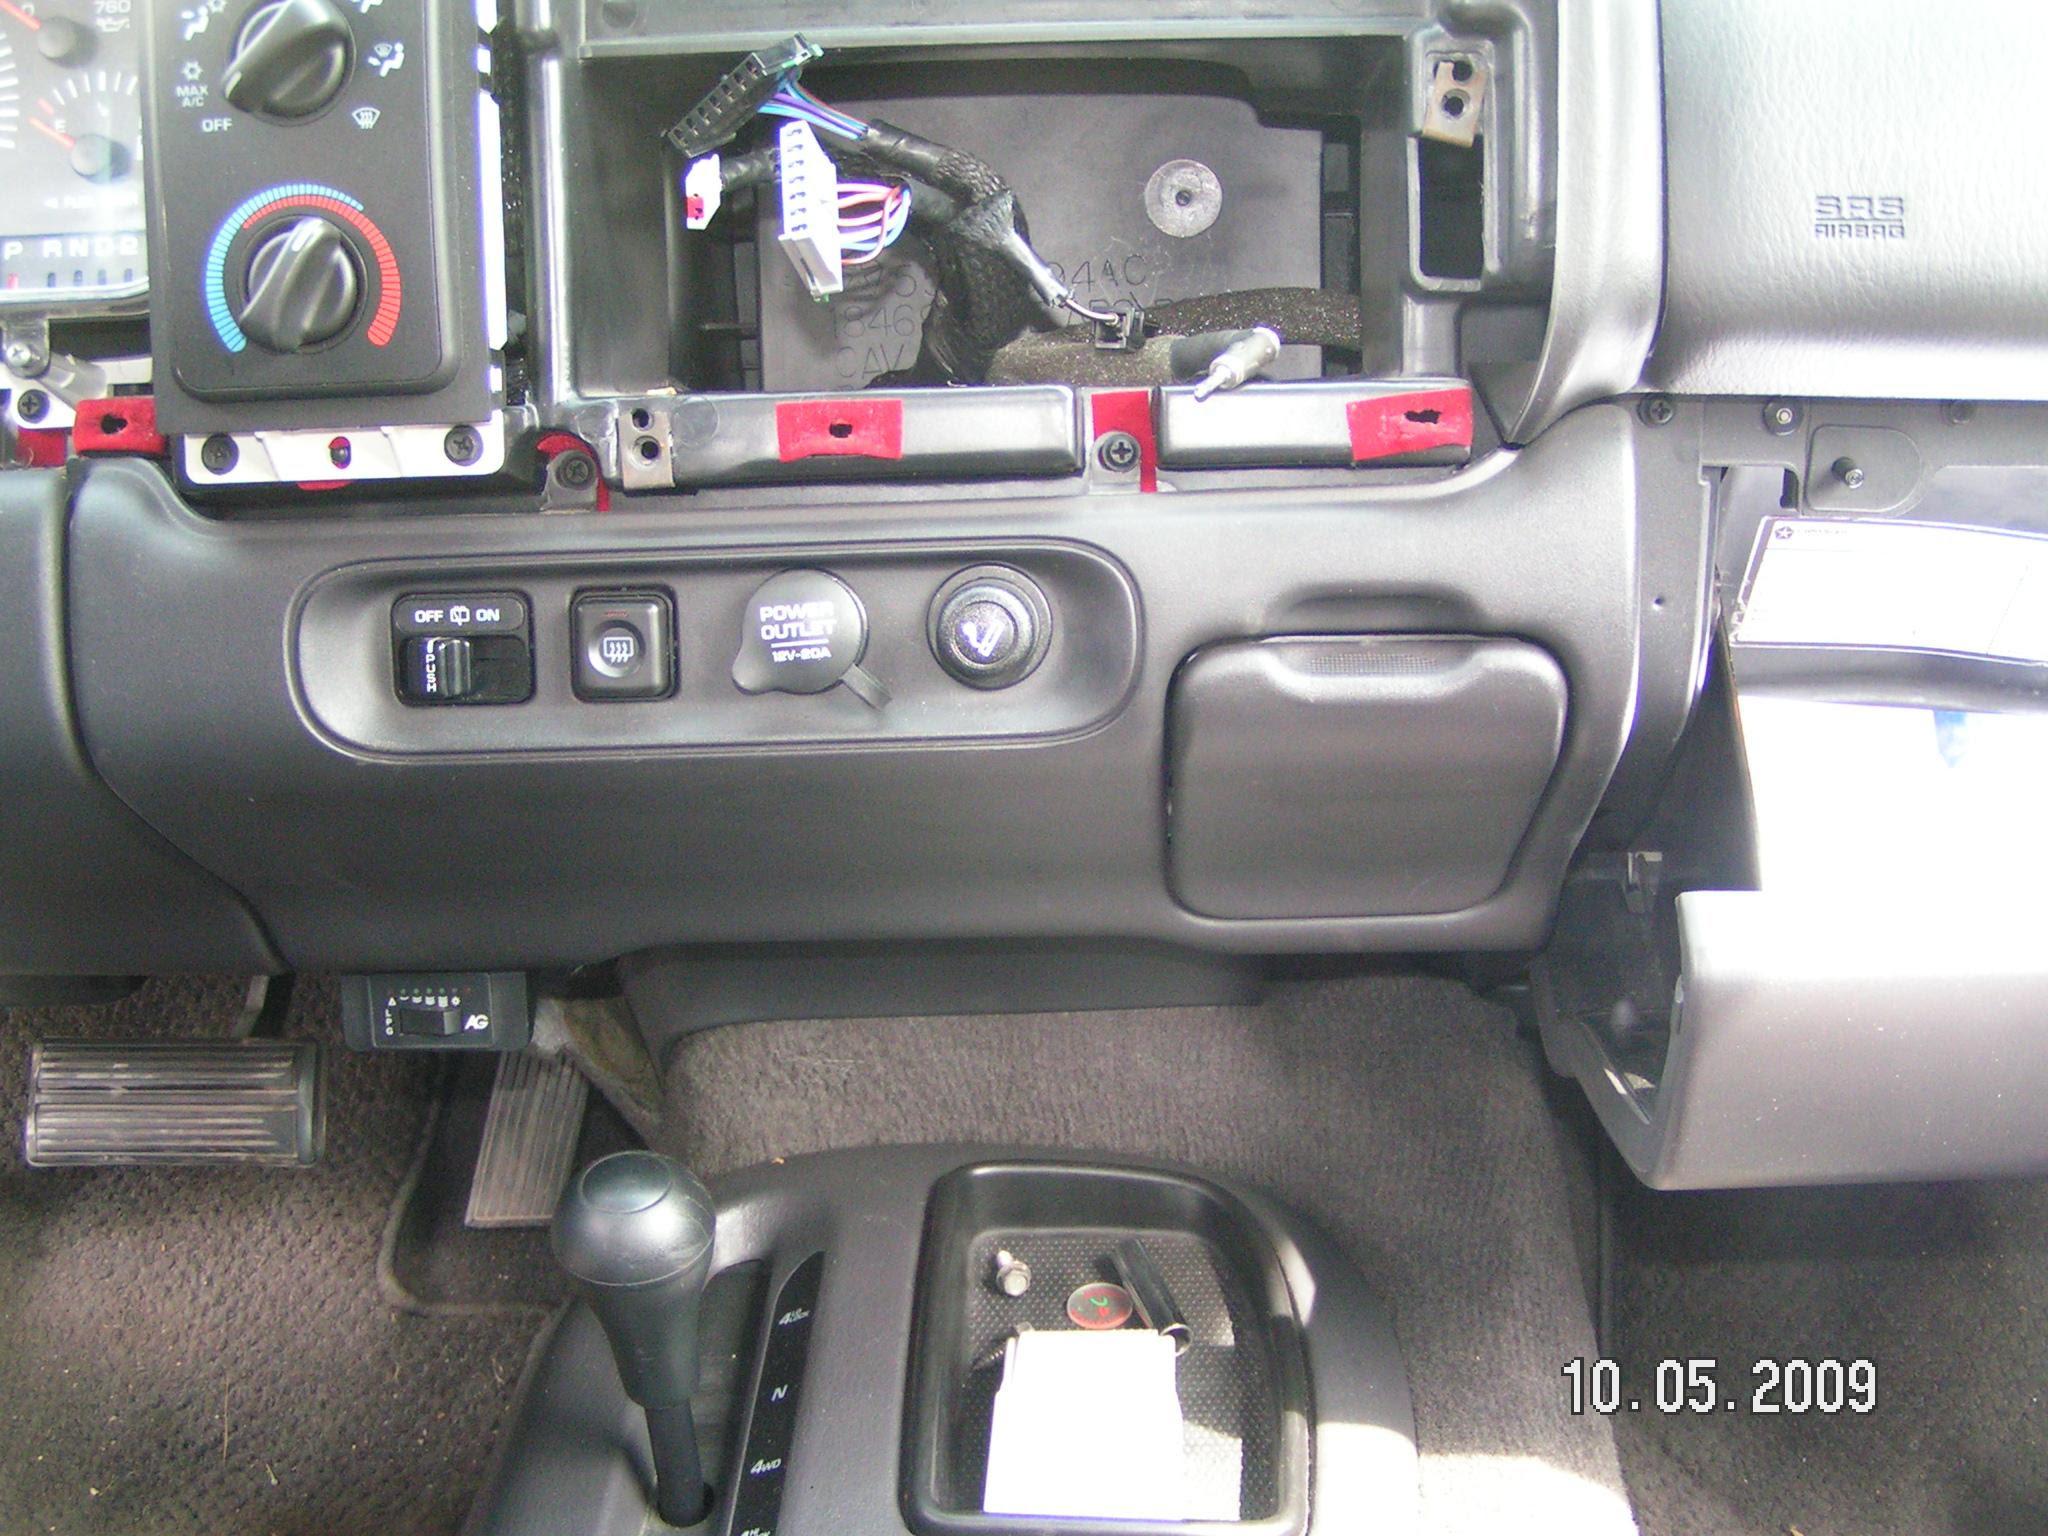 99 Dodge Durango Stereo Wiring Diagram - Wiring Data